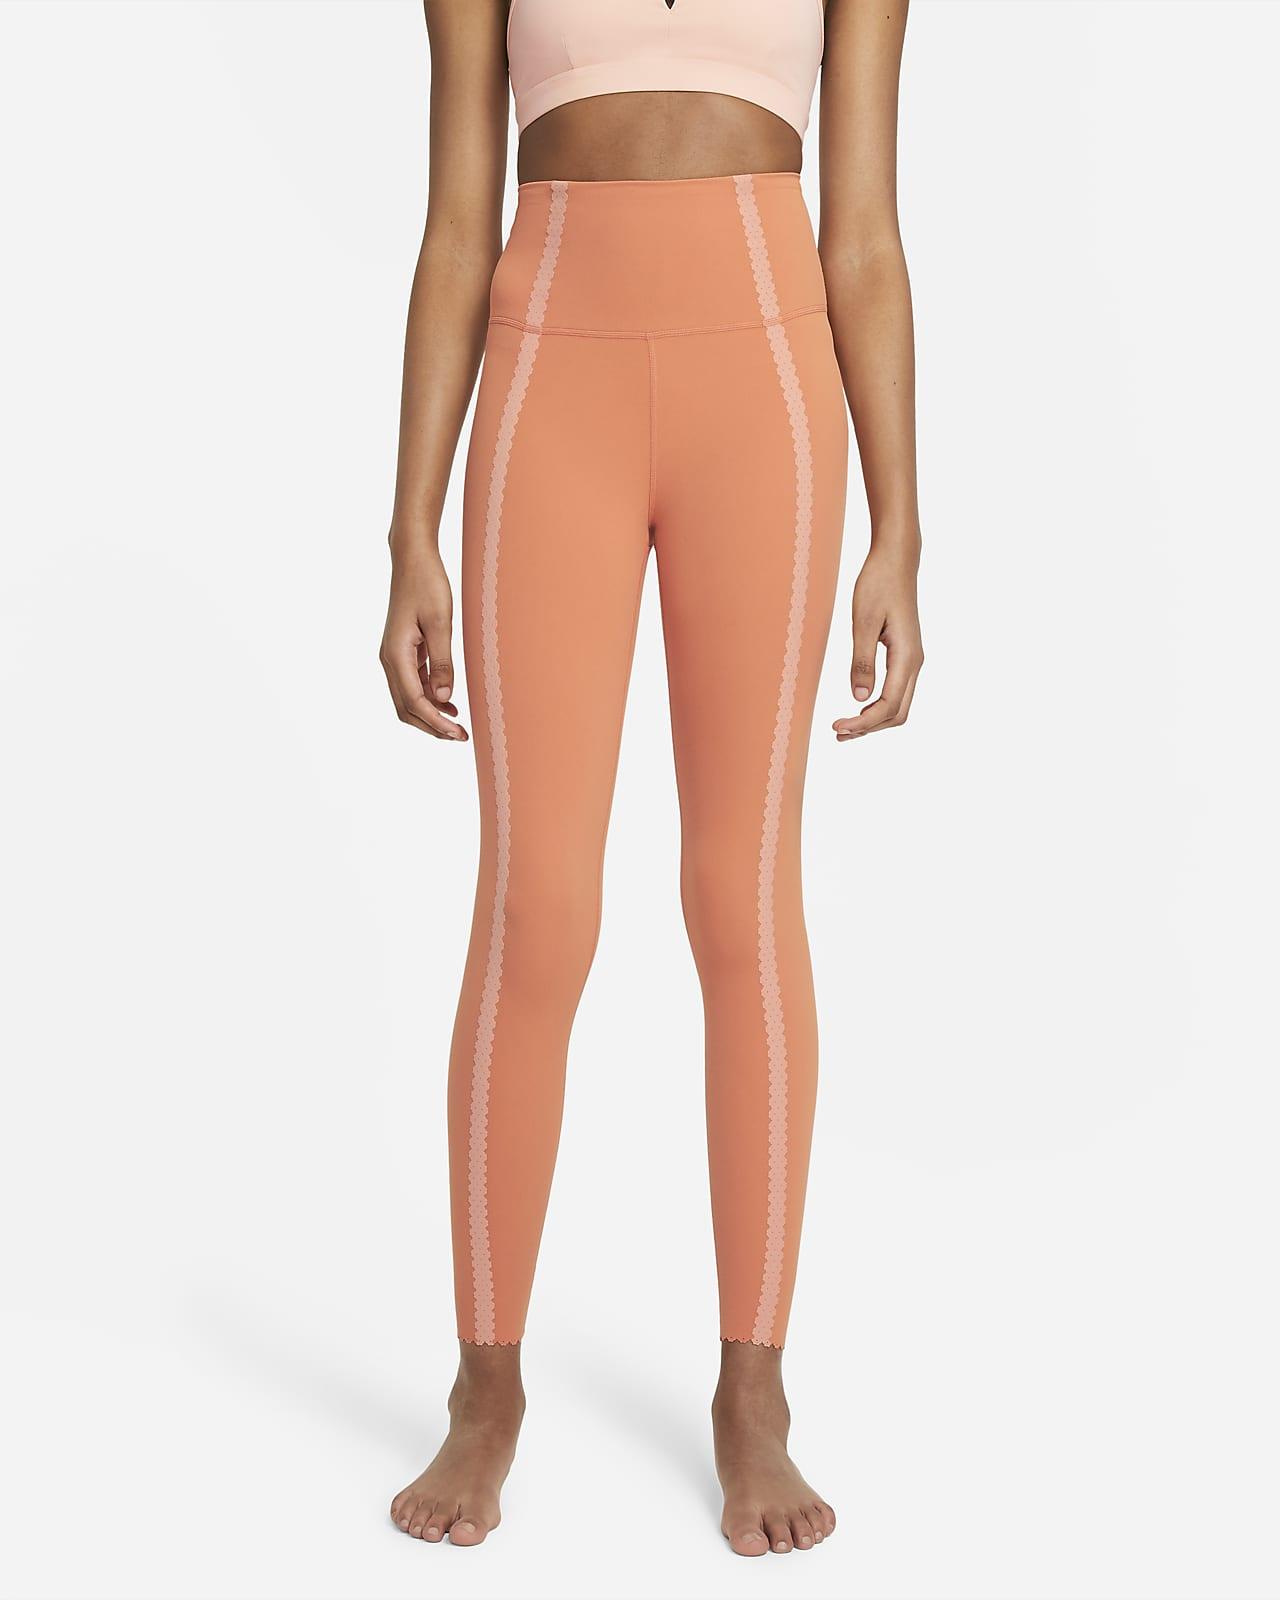 Nike Yoga Luxe 7/8-os, magas derekú, fűzőlyukas női leggings